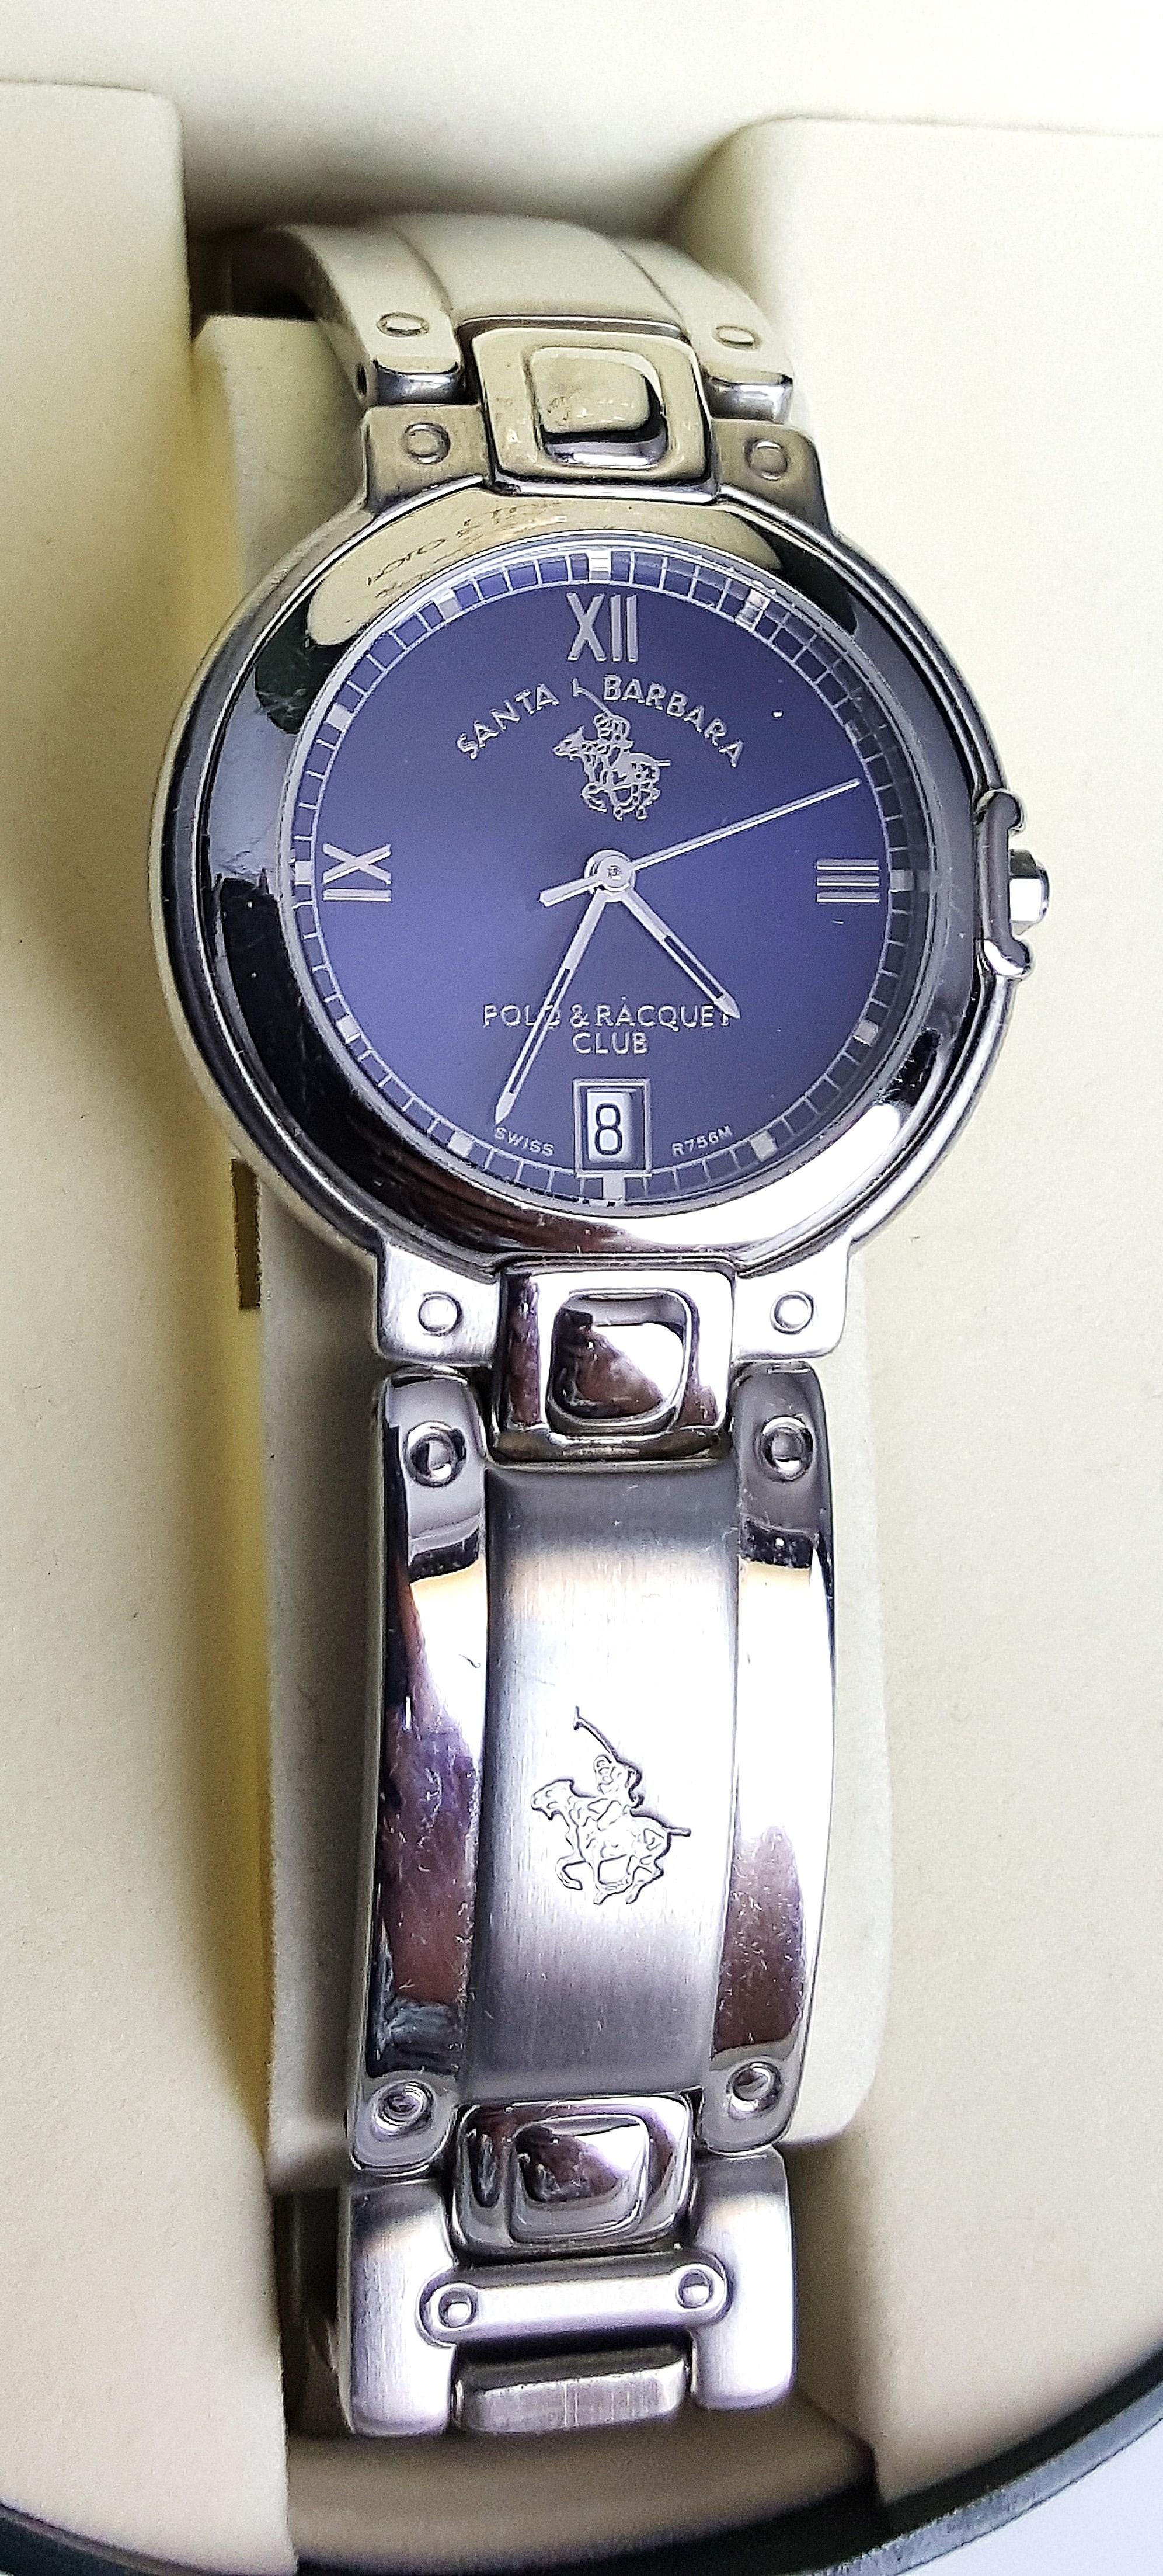 Santa barbara polo racquet club wristwatch swiss r756m for Santa barbara polo shirt